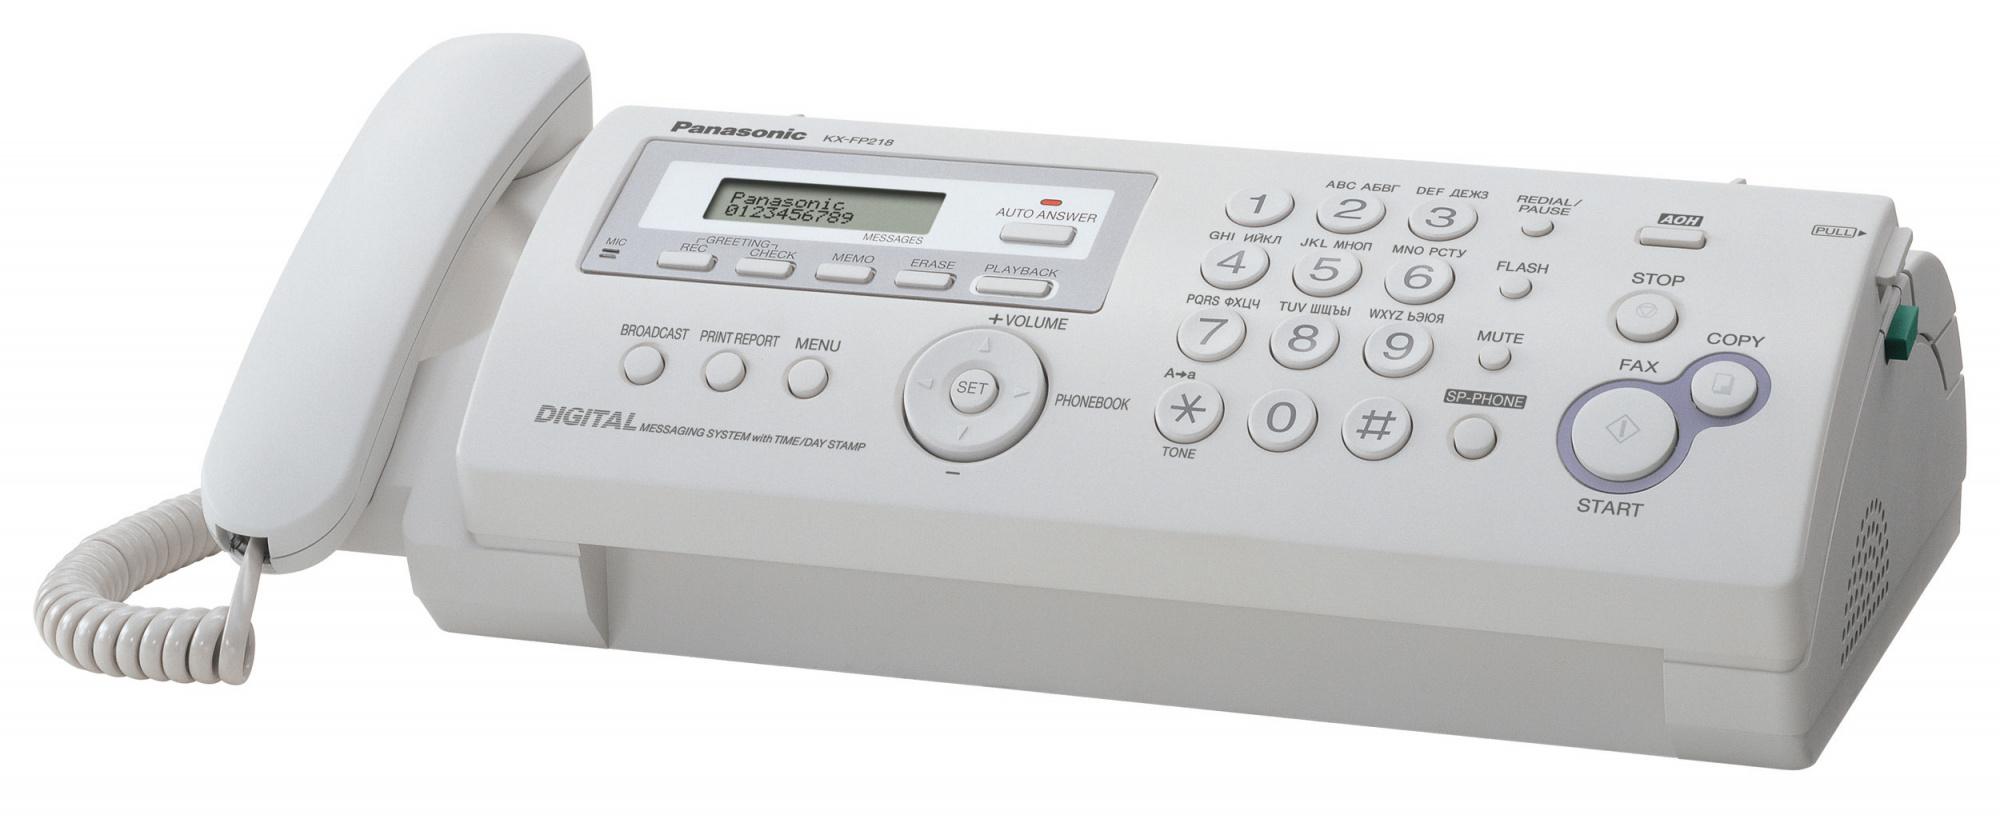 Panasonic KX FP218RU ���00002073